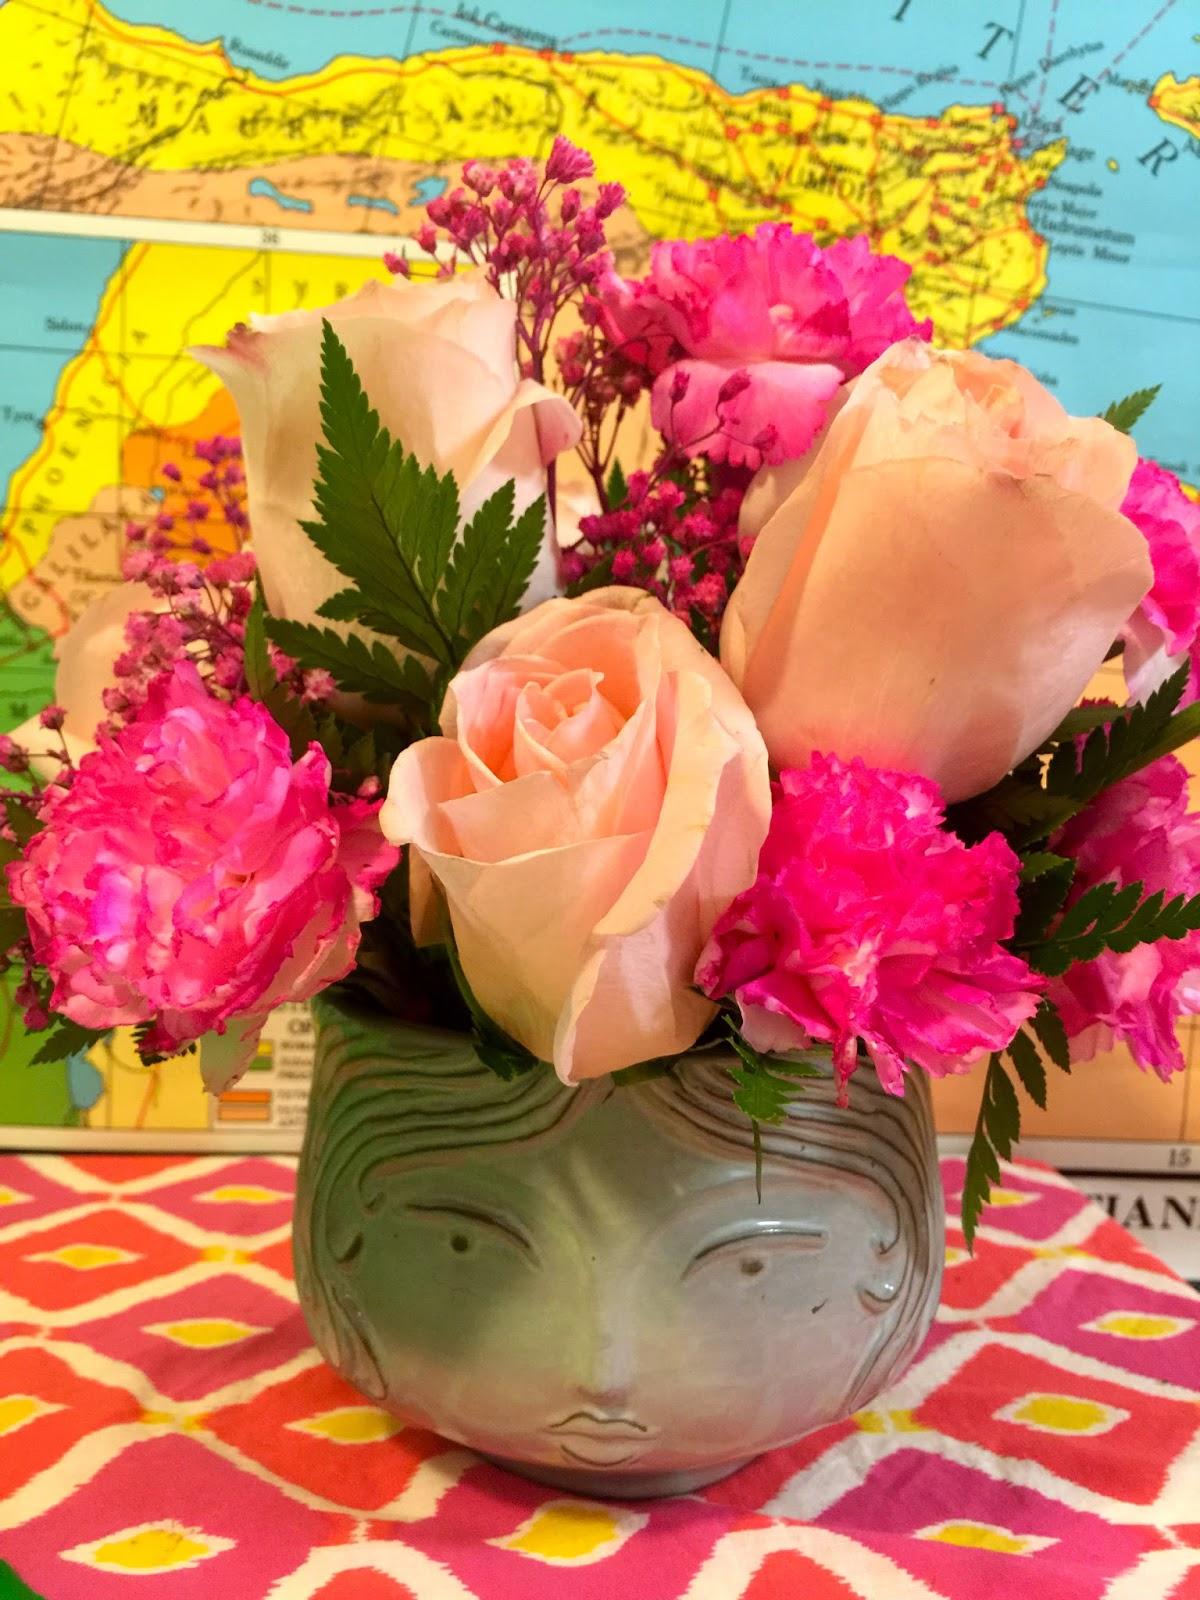 Last name taylor june 2015 birthday flowers from beau izmirmasajfo